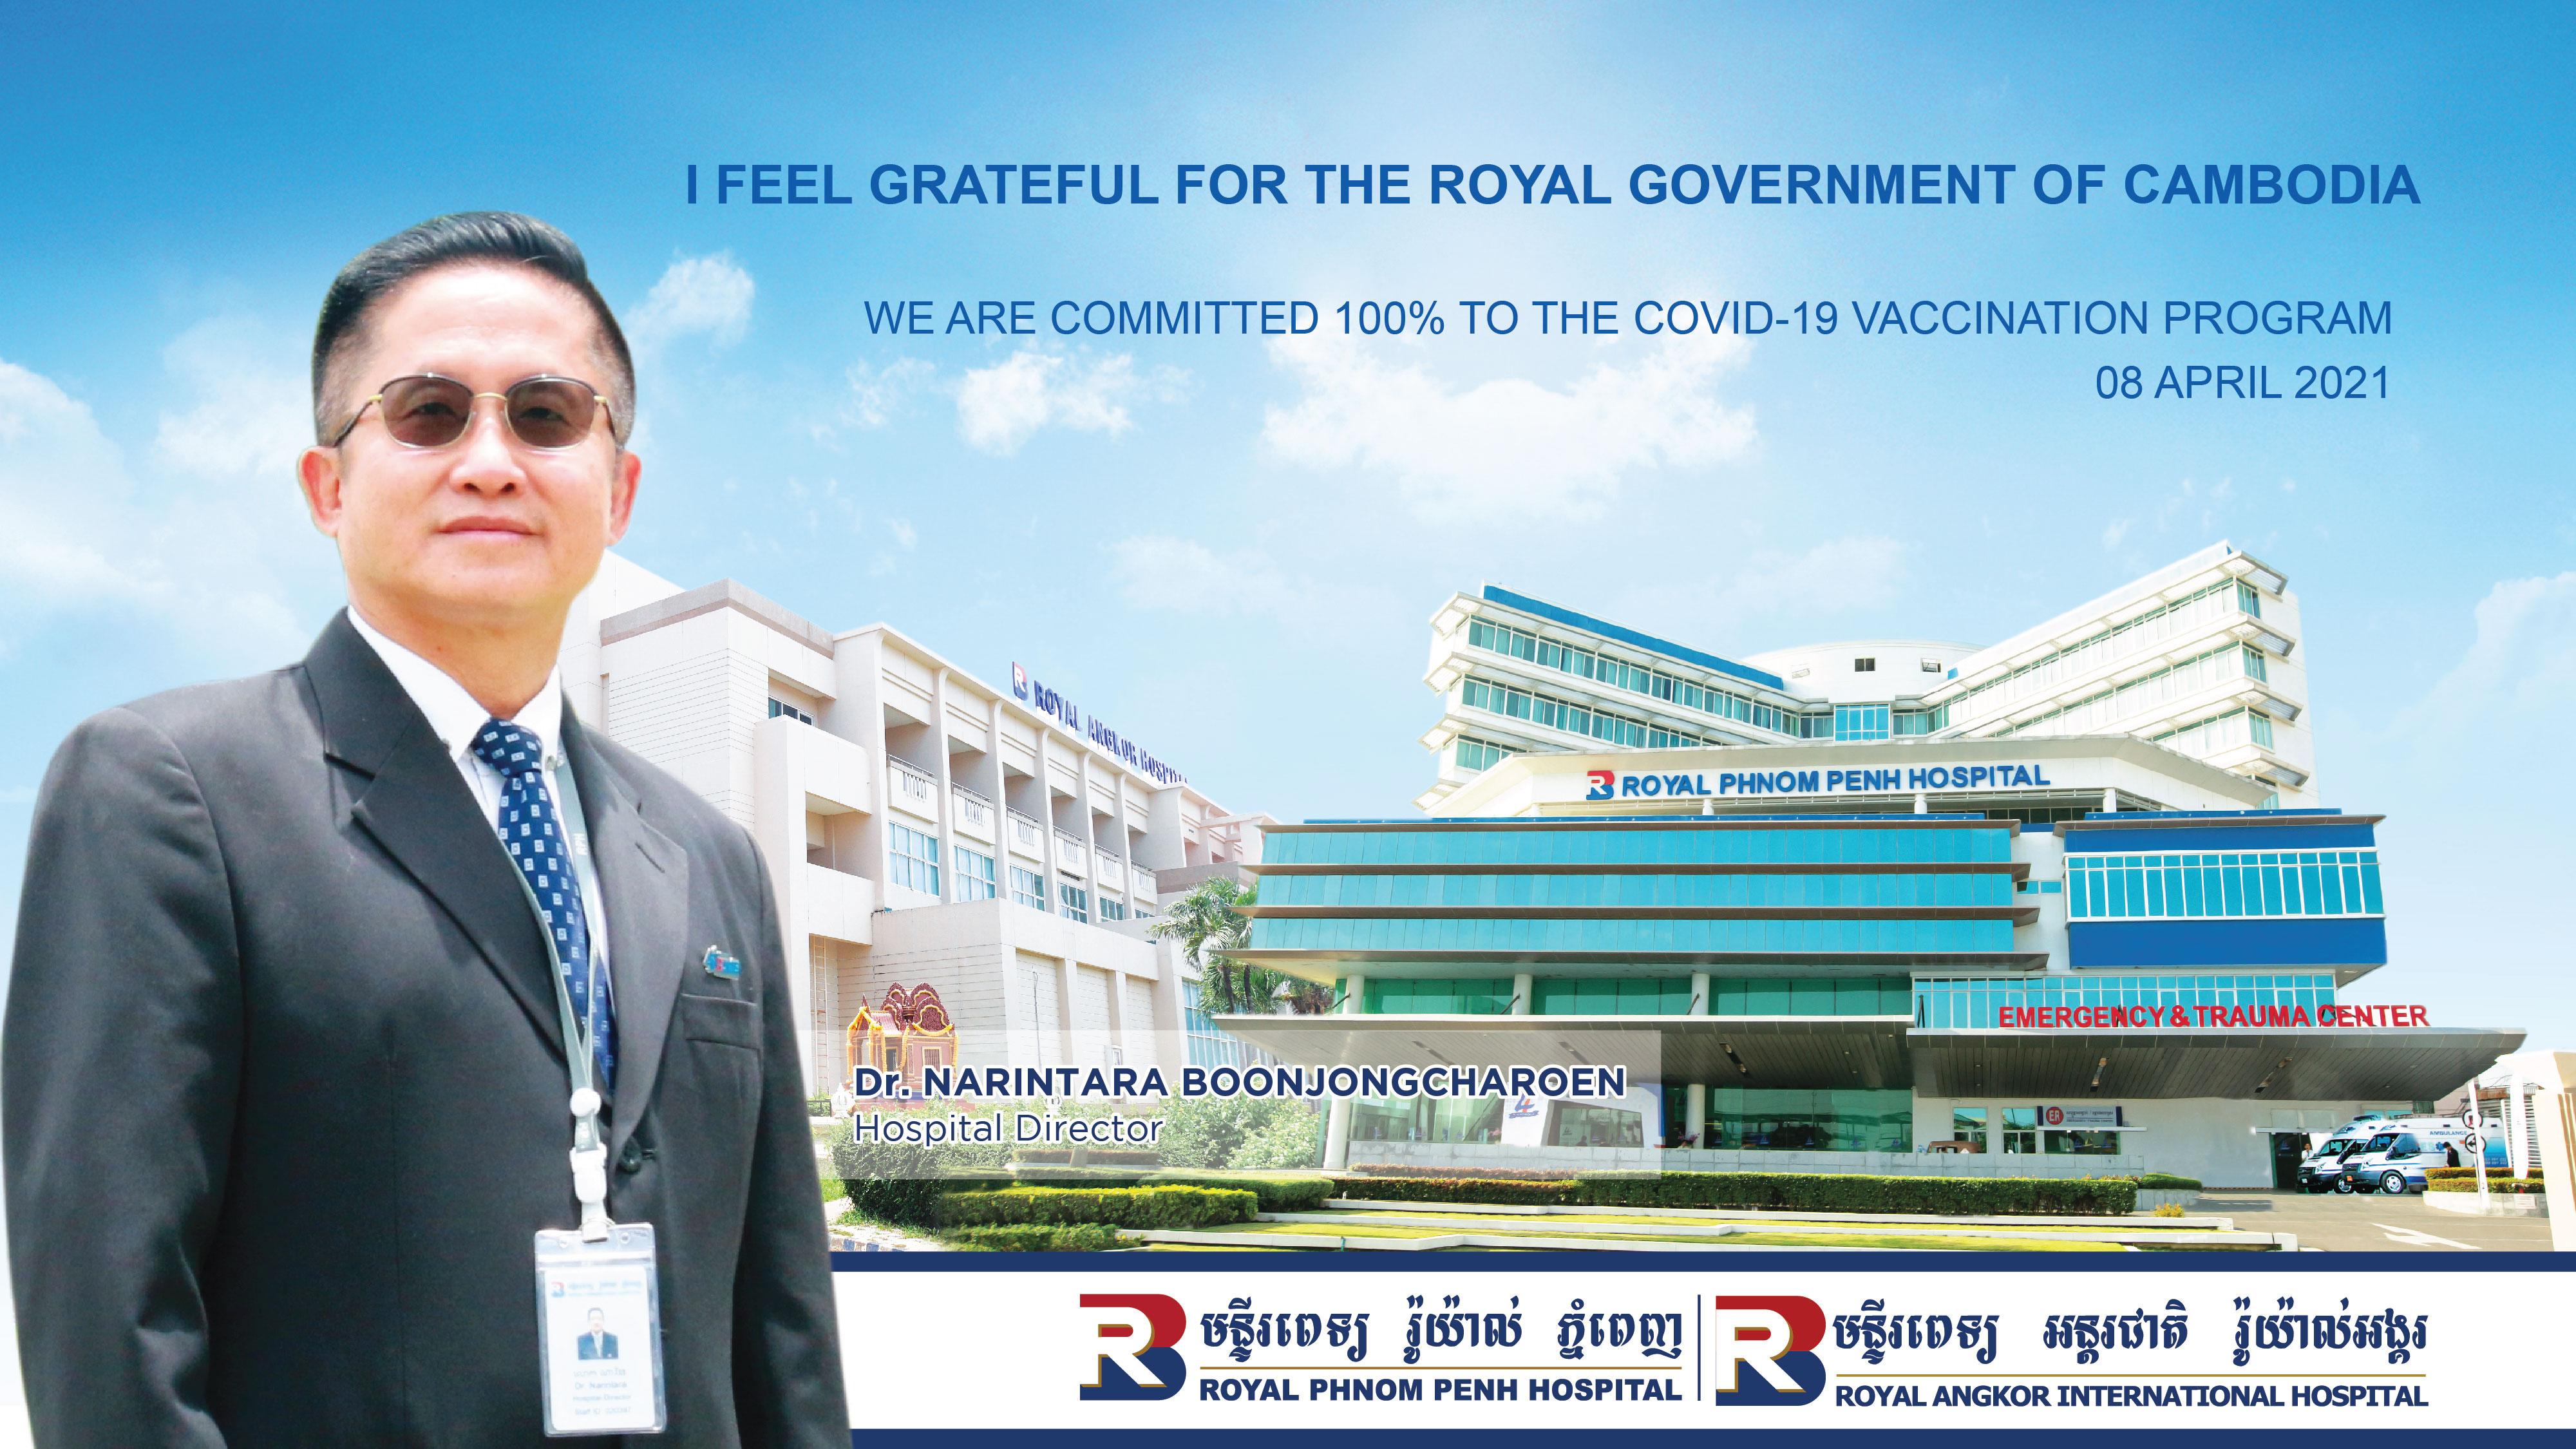 Royal Phnom Penh Hospital_COVID 19 VACCINATION PROGRAM